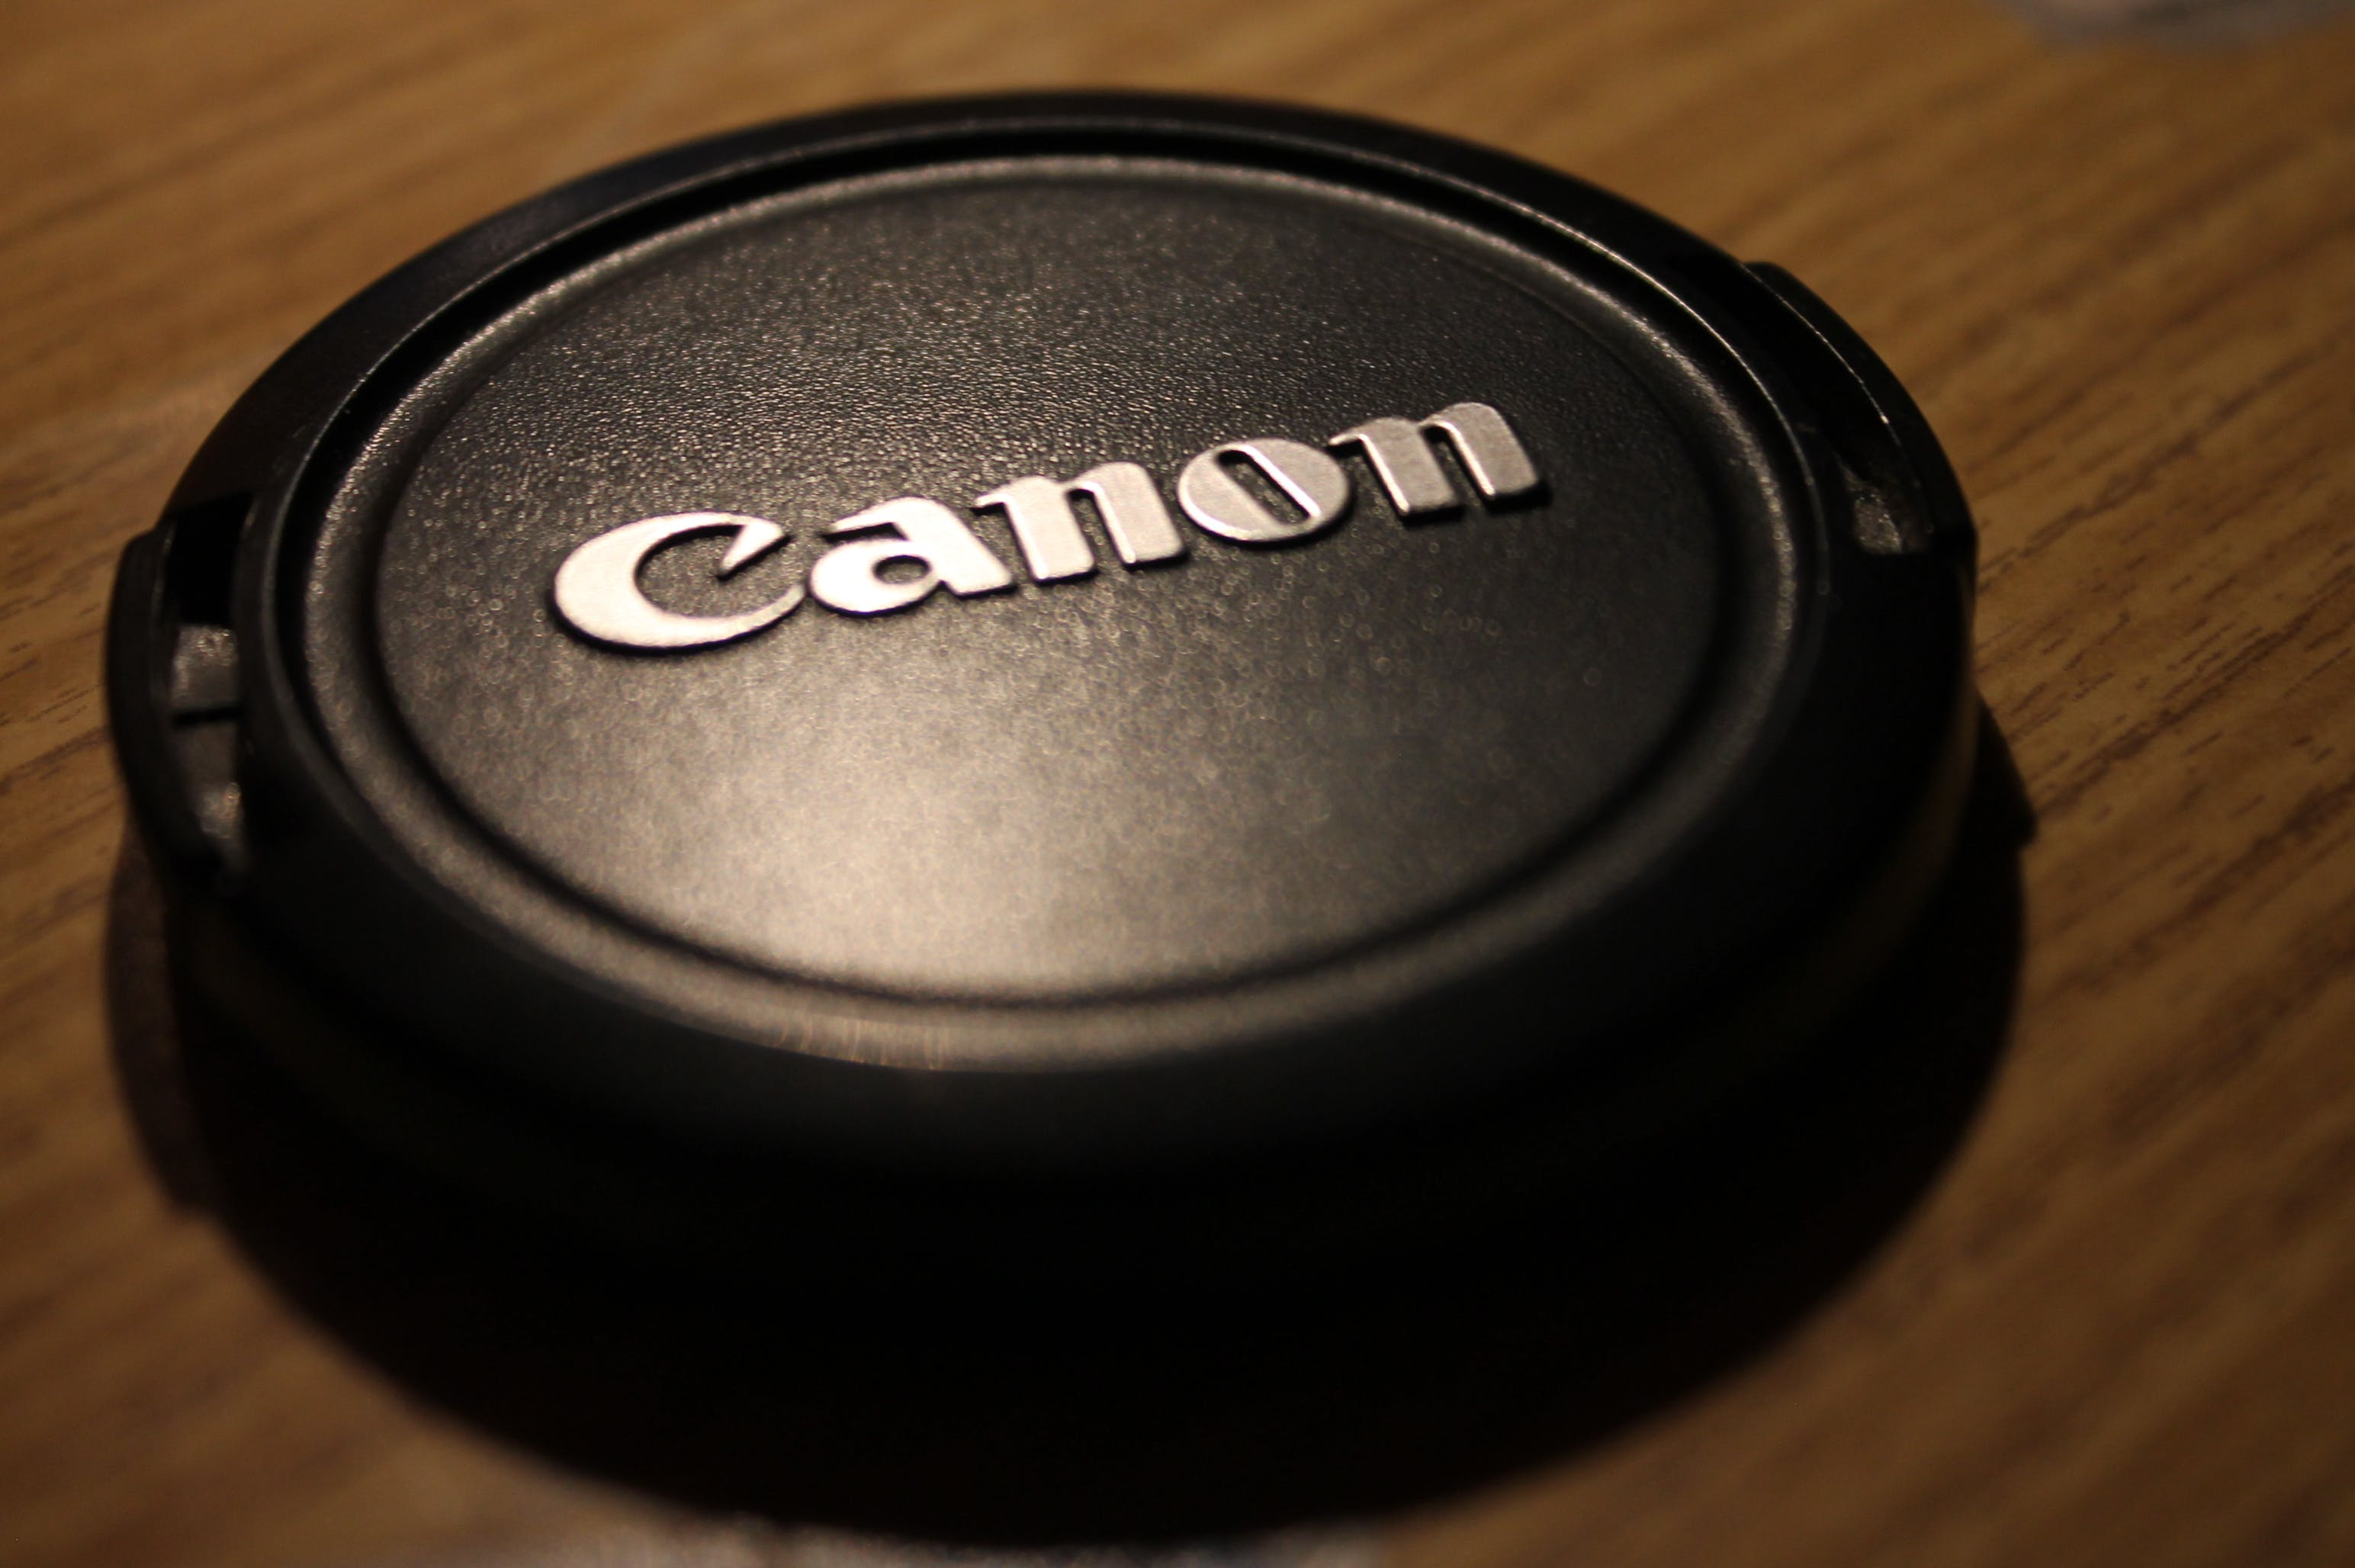 Black Canon Camera Lens Cover